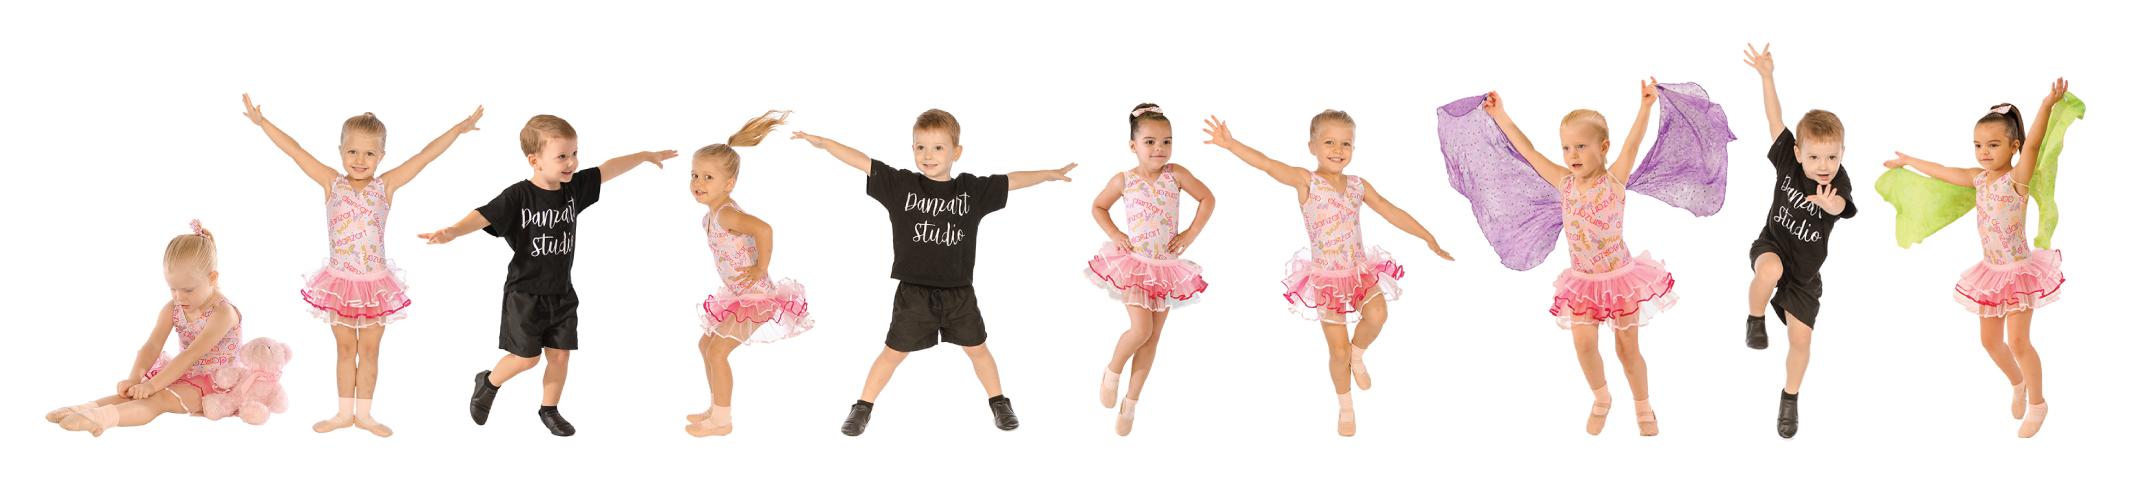 danceforpre-school